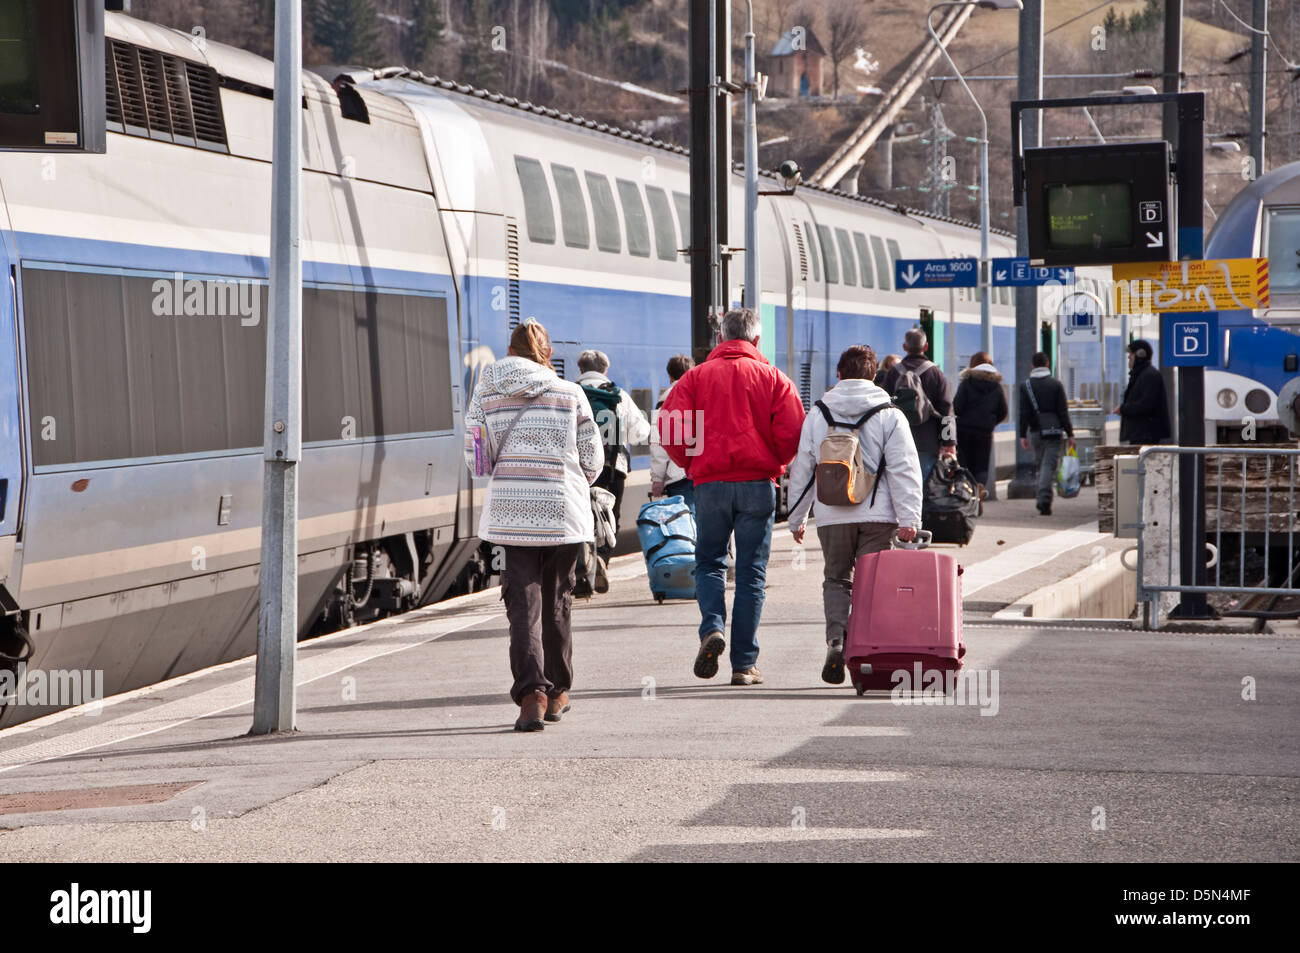 Passengers walking on a station platform toward the train - Bourg Saint Marice, France - Stock Image